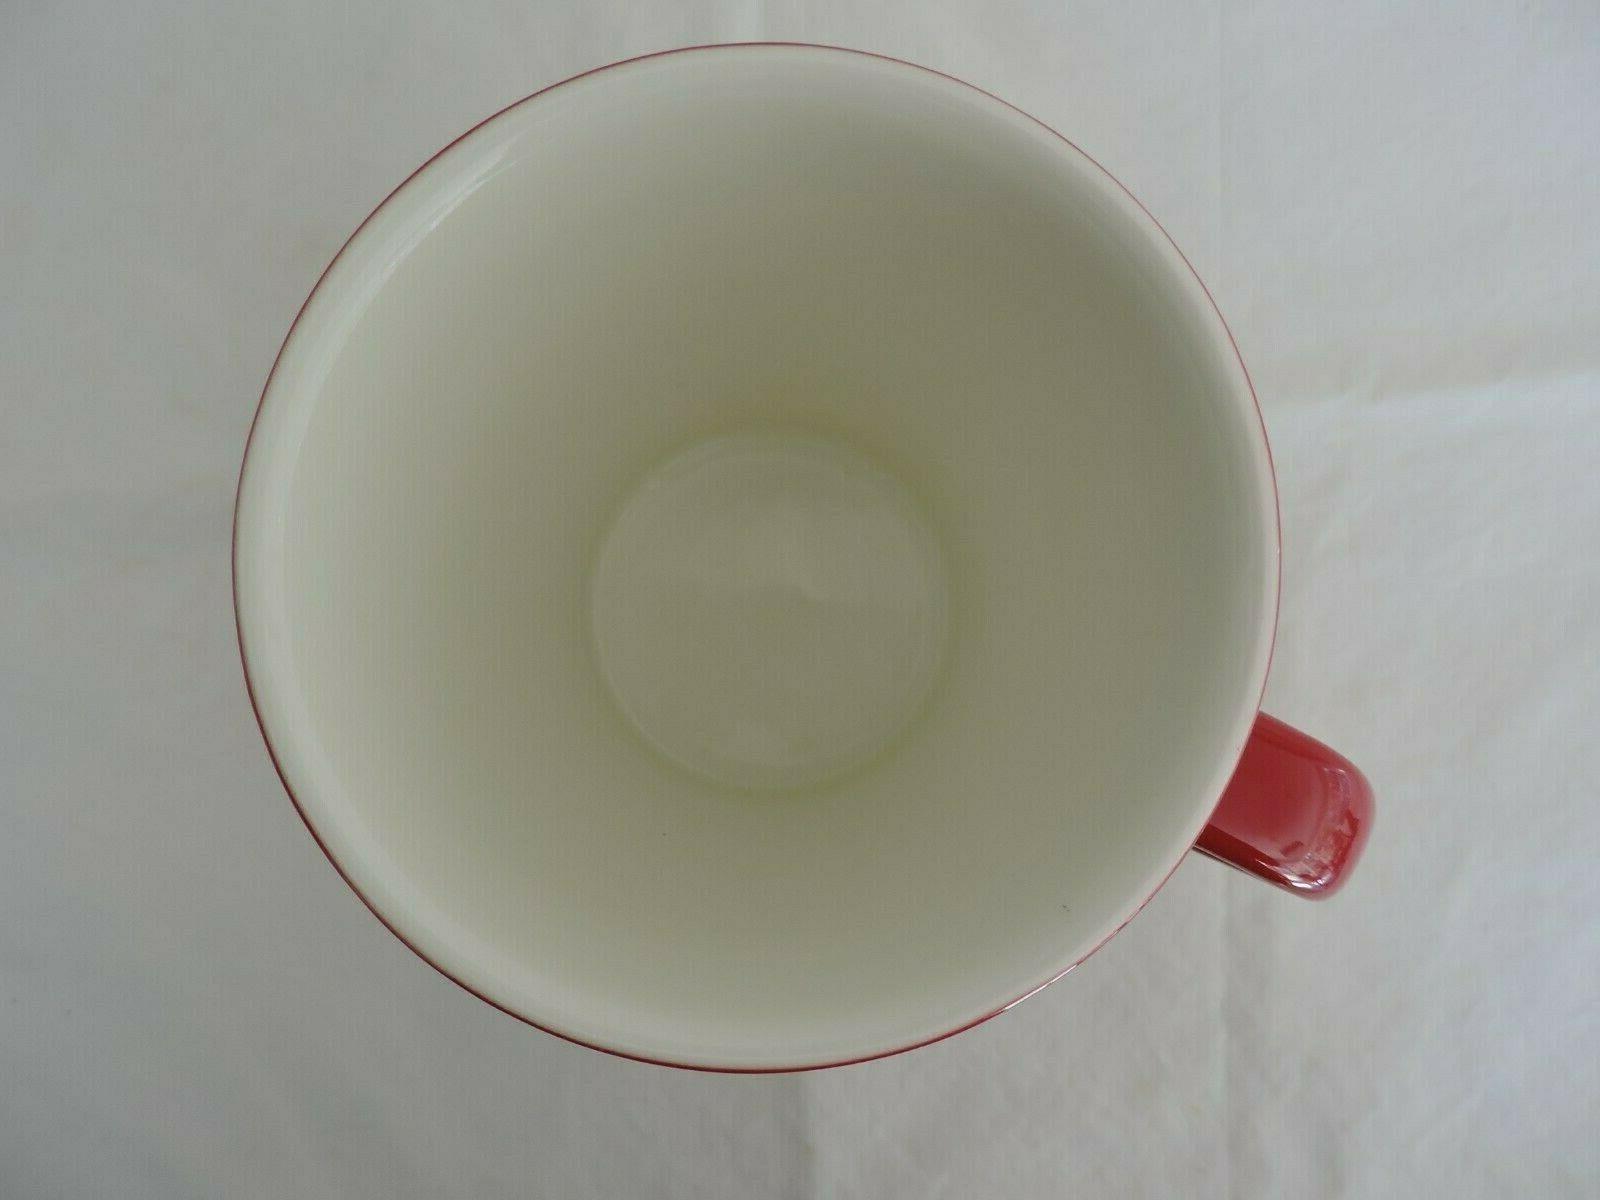 Starbucks Red Ceramic Coffee Tea Mug Cup White New